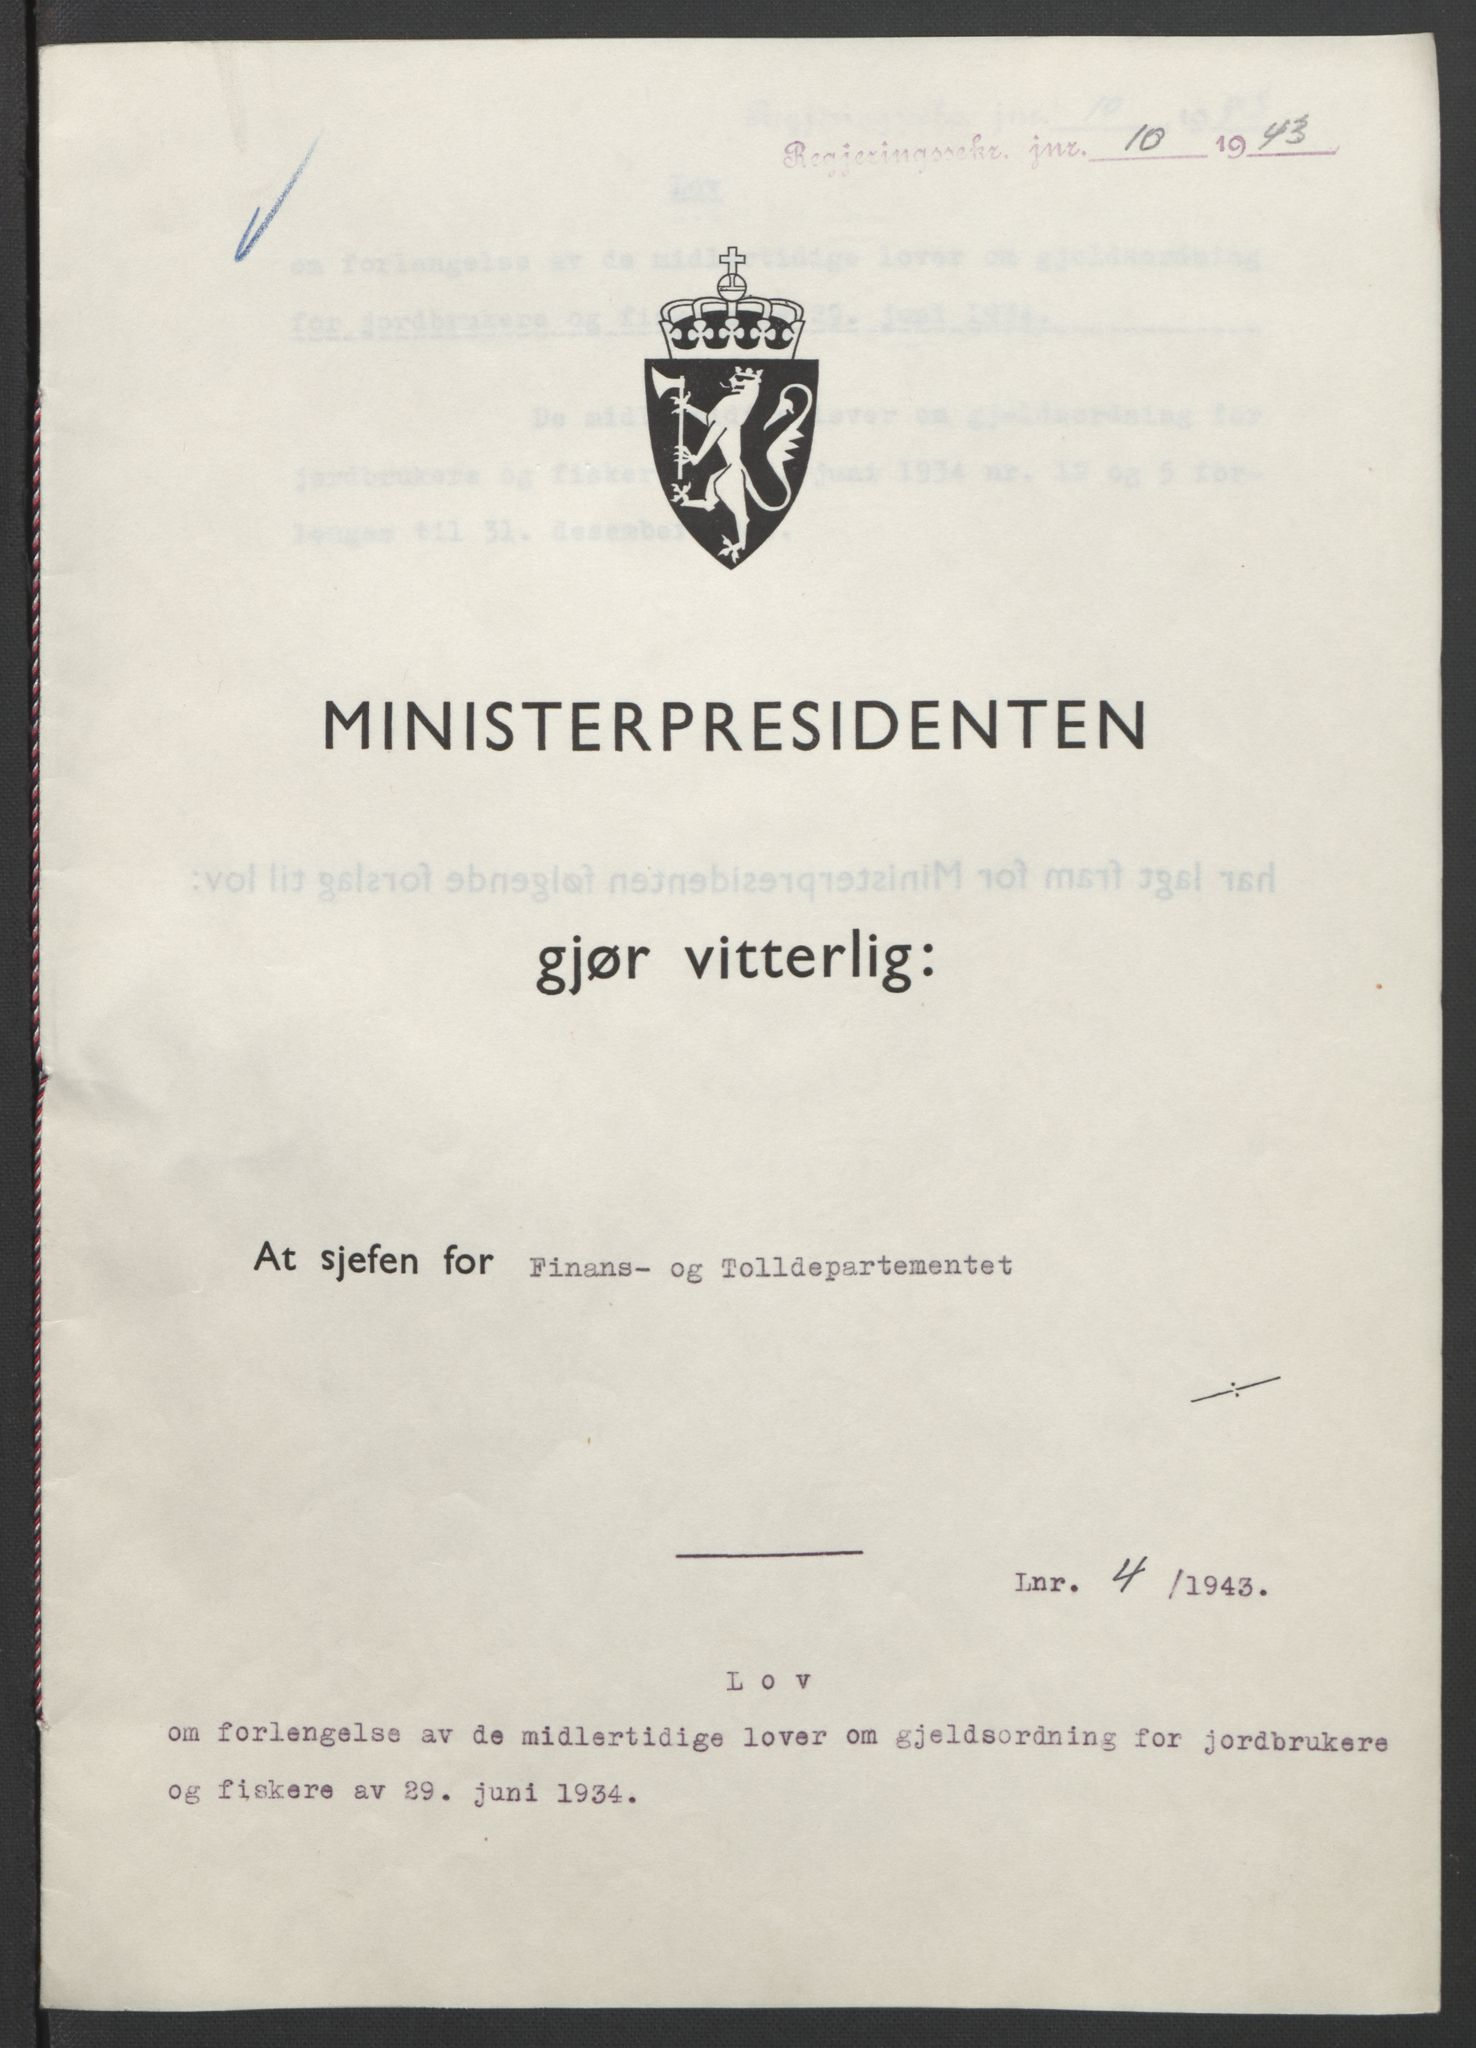 RA, NS-administrasjonen 1940-1945 (Statsrådsekretariatet, de kommisariske statsråder mm), D/Db/L0099: Lover, 1943, s. 18